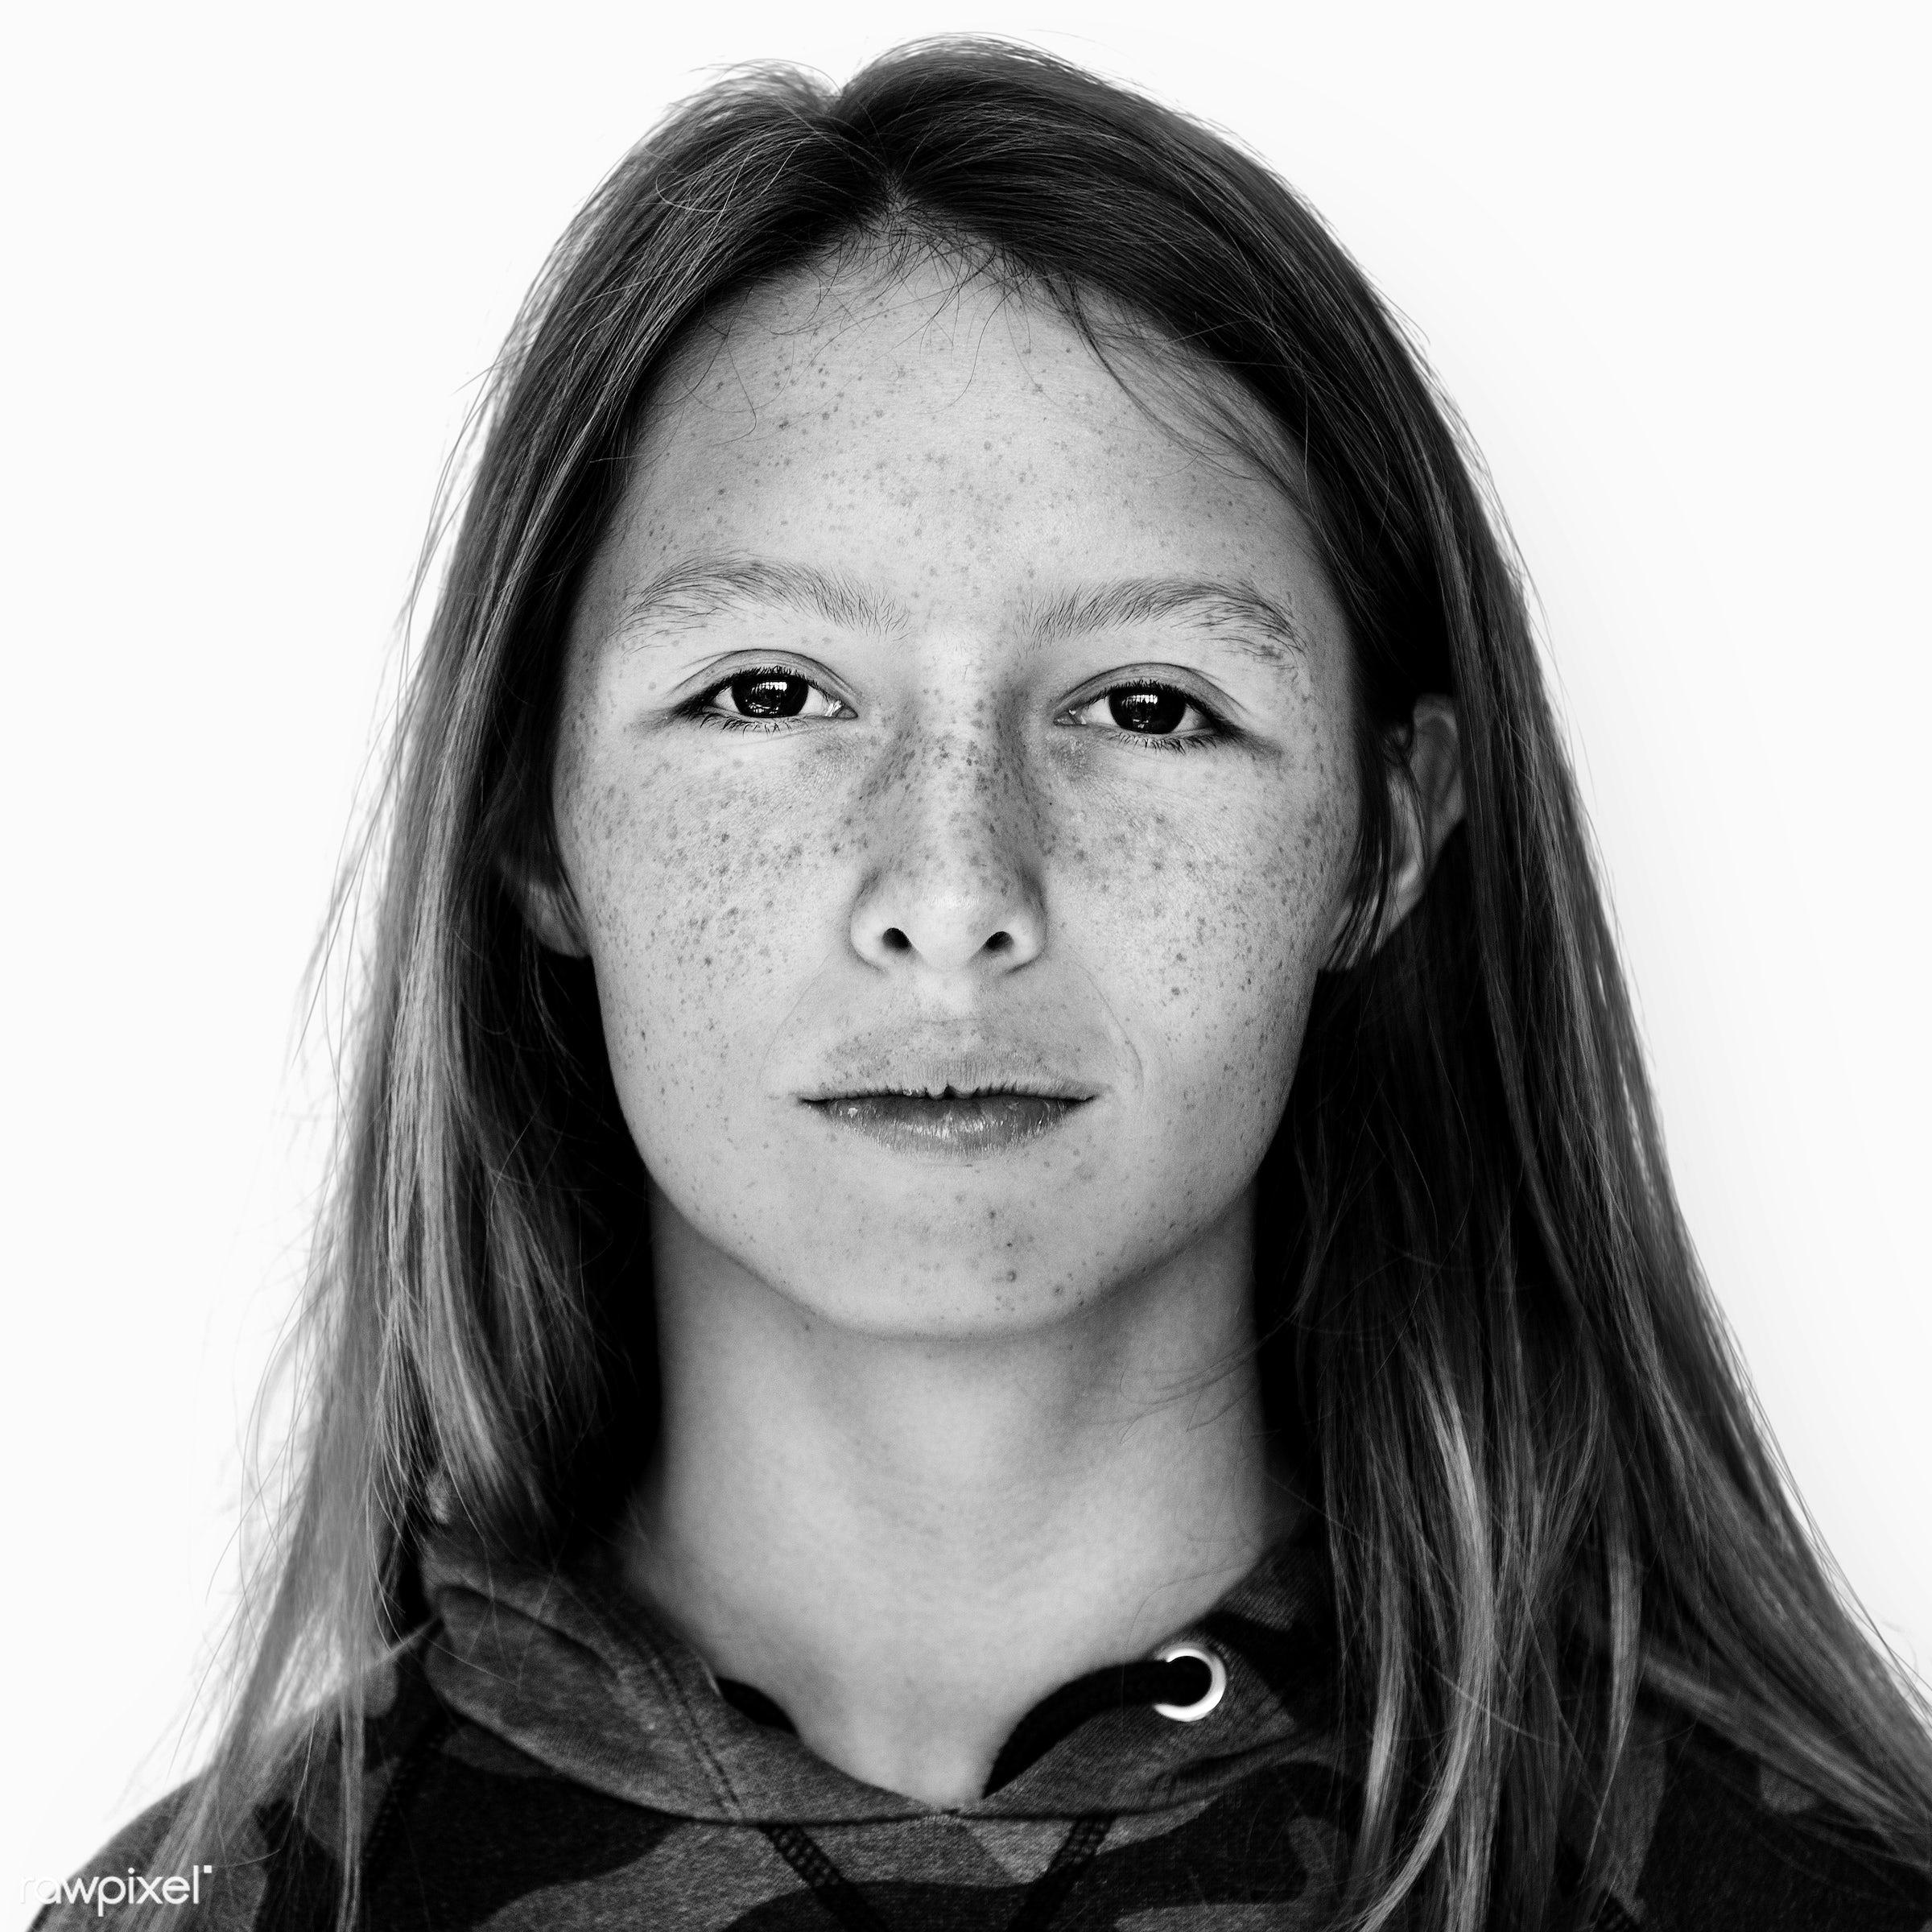 Portrait of an Australian girl - alone, australia, australian, black and white, casual, caucasian, emotion, expression, face...